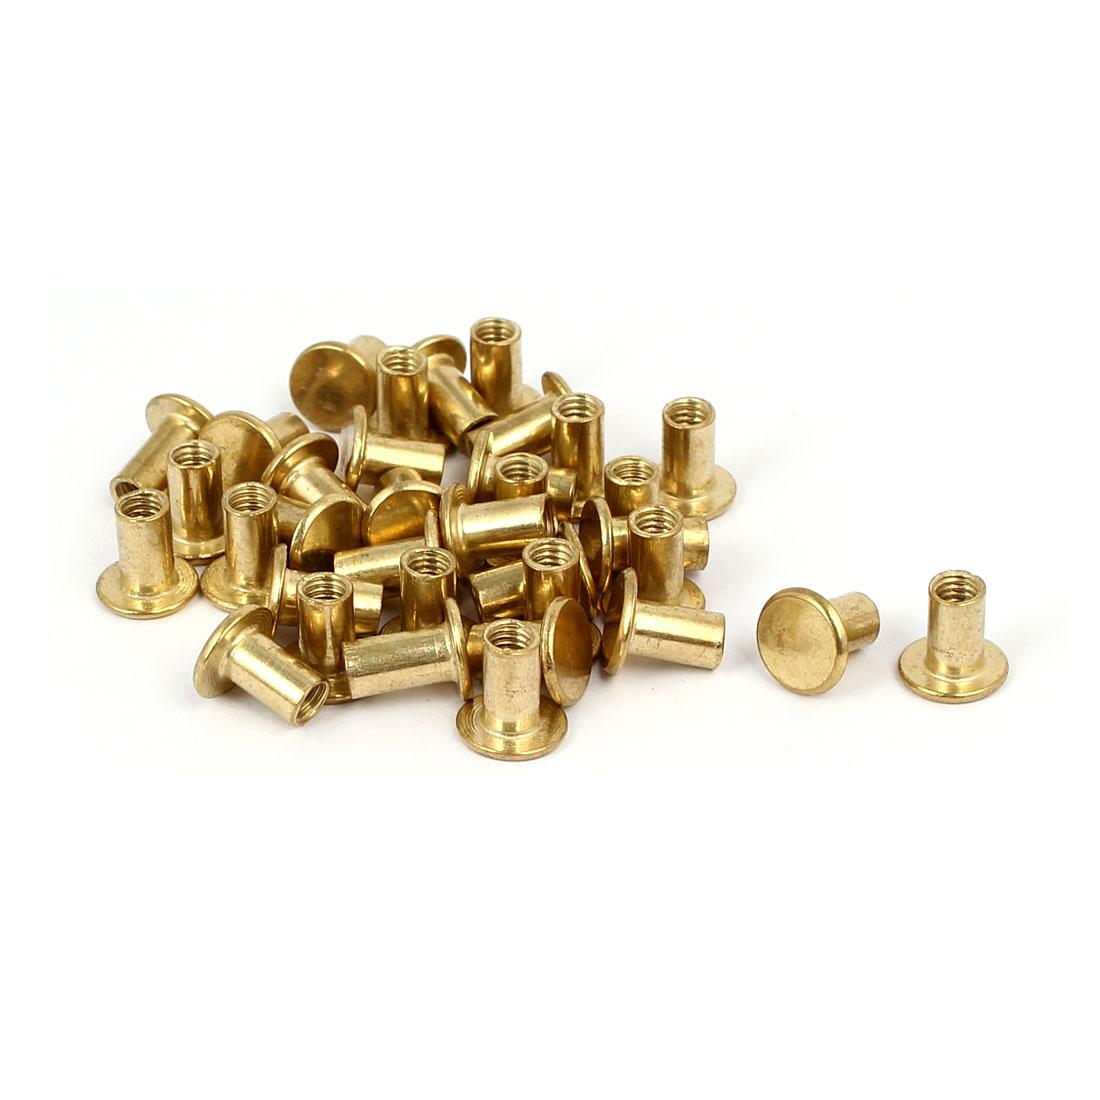 Photo Album Metal Brass Plated Binding Screw Post Barrel Nut 5mmx8mm 35pcs